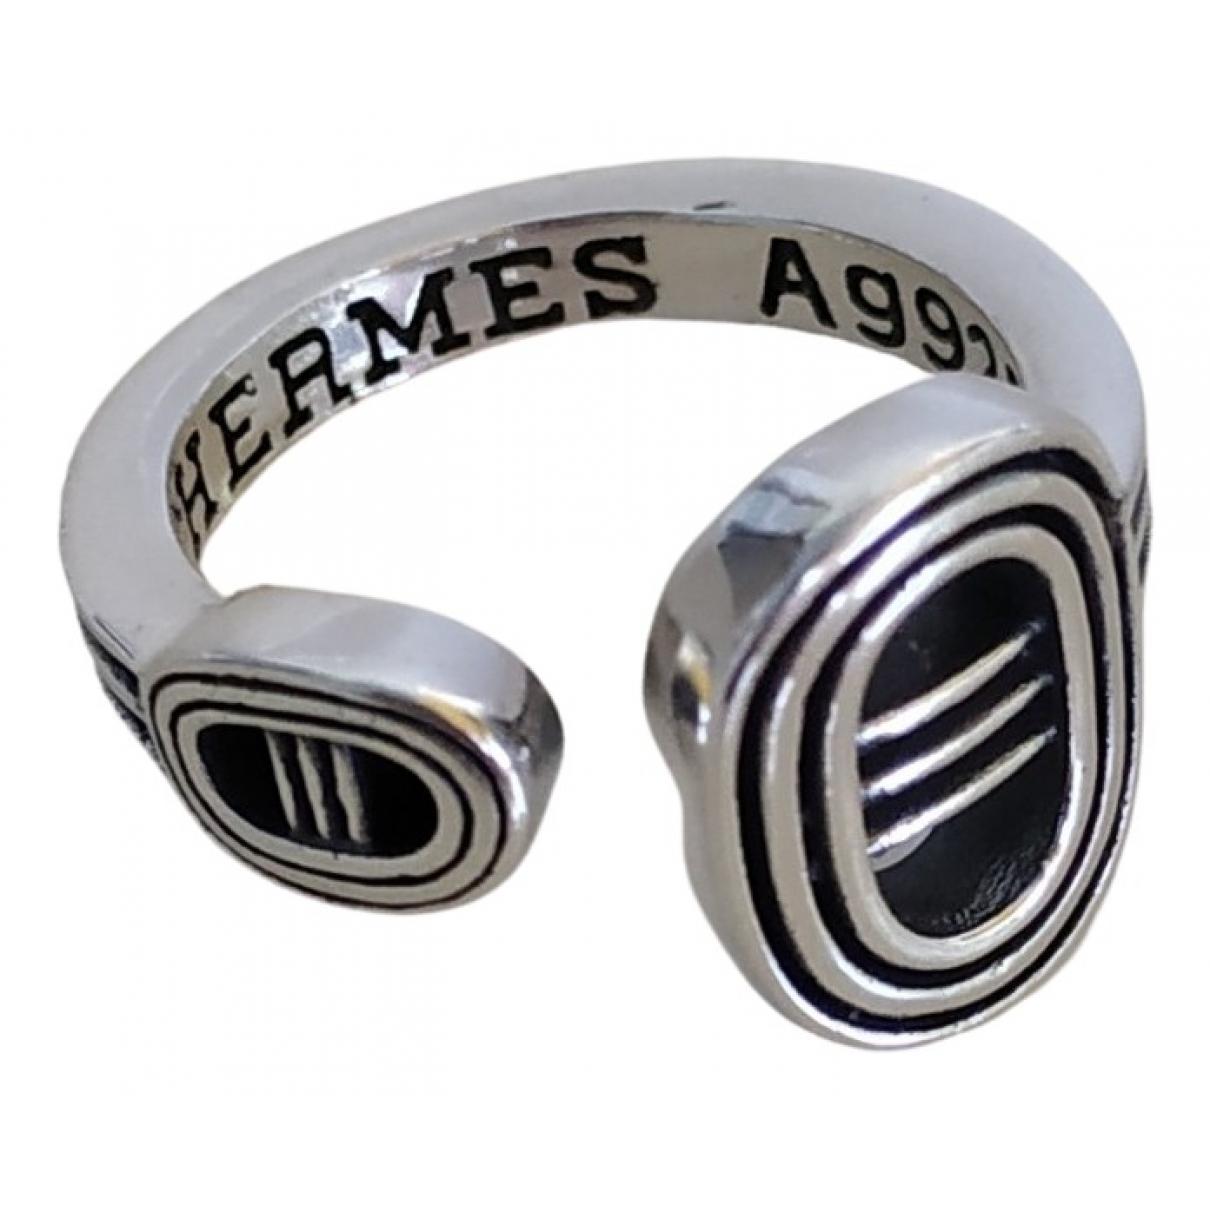 Joya de Plata Hermes